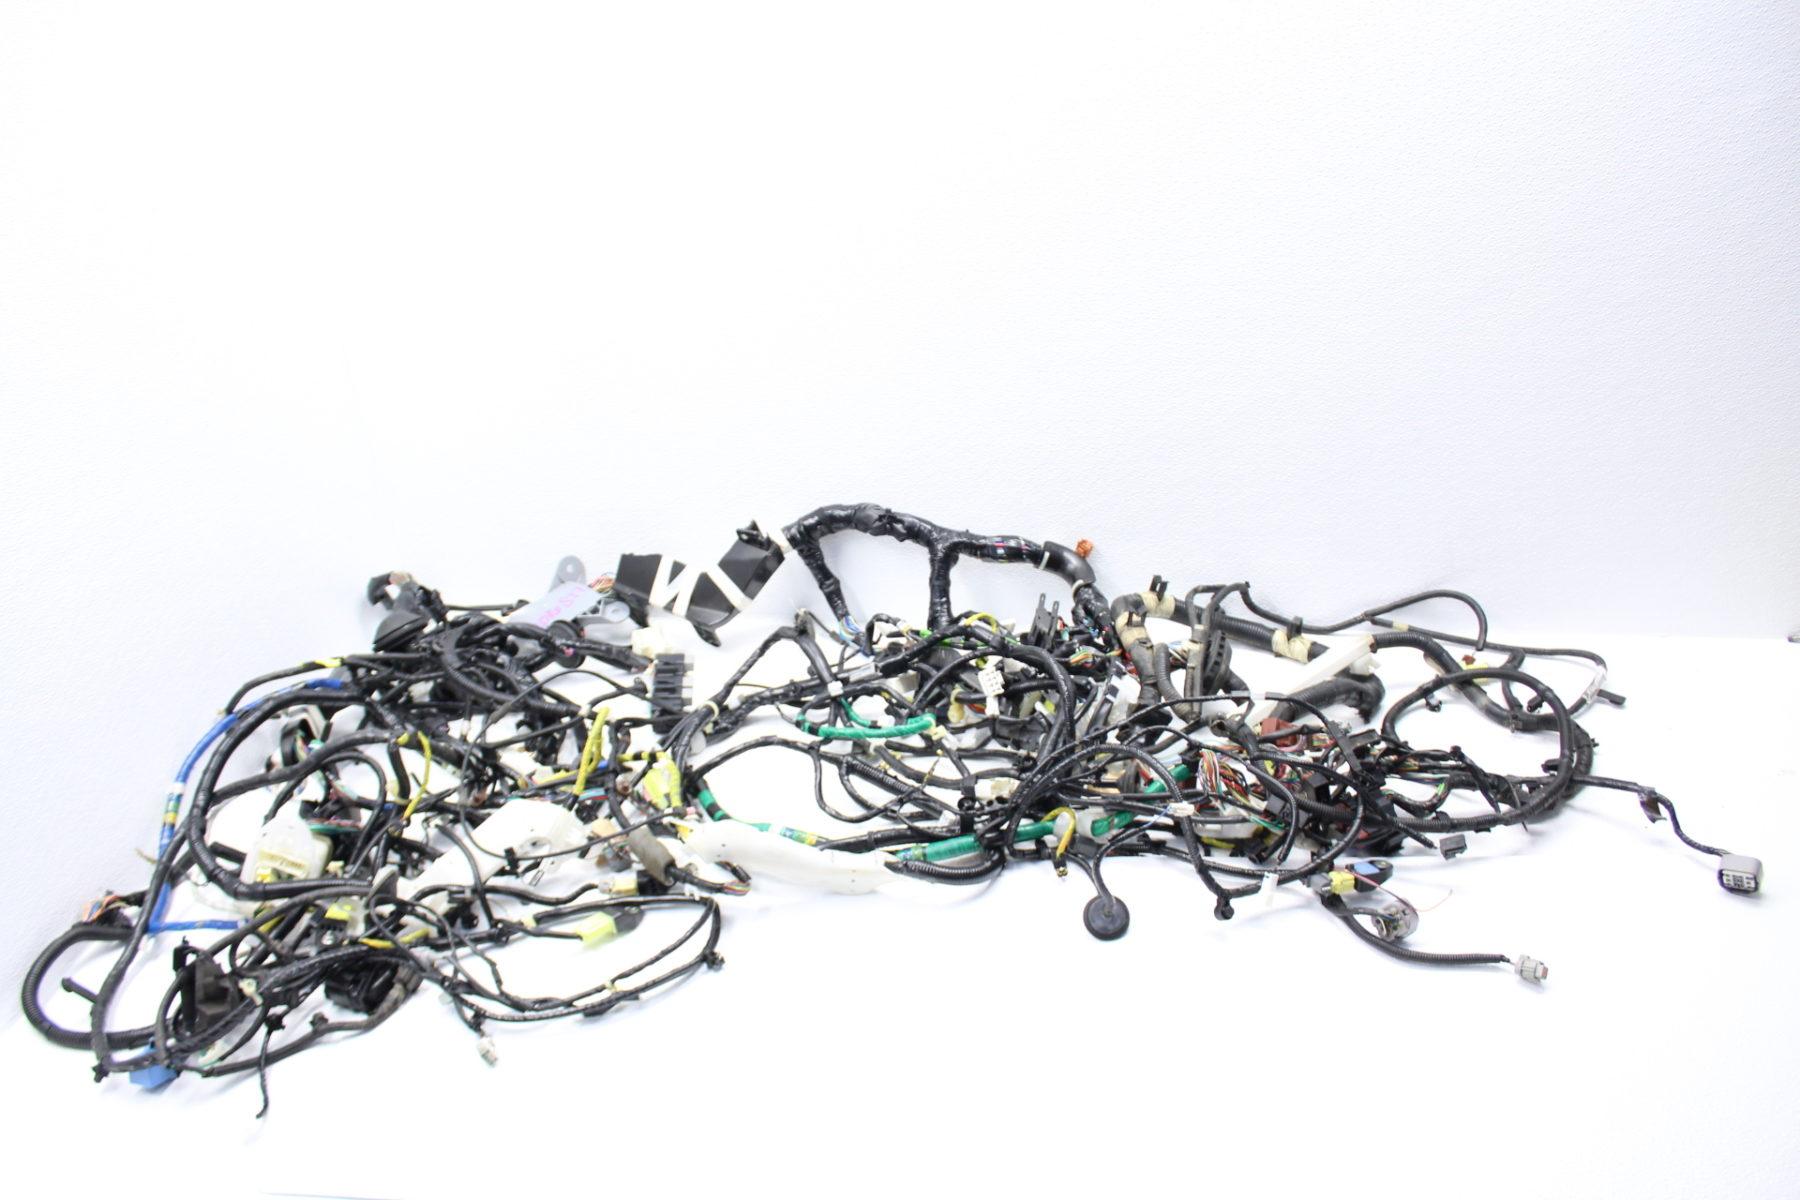 Subaru Wrx Sti Main Bulk Wiring Harness Dash Wires